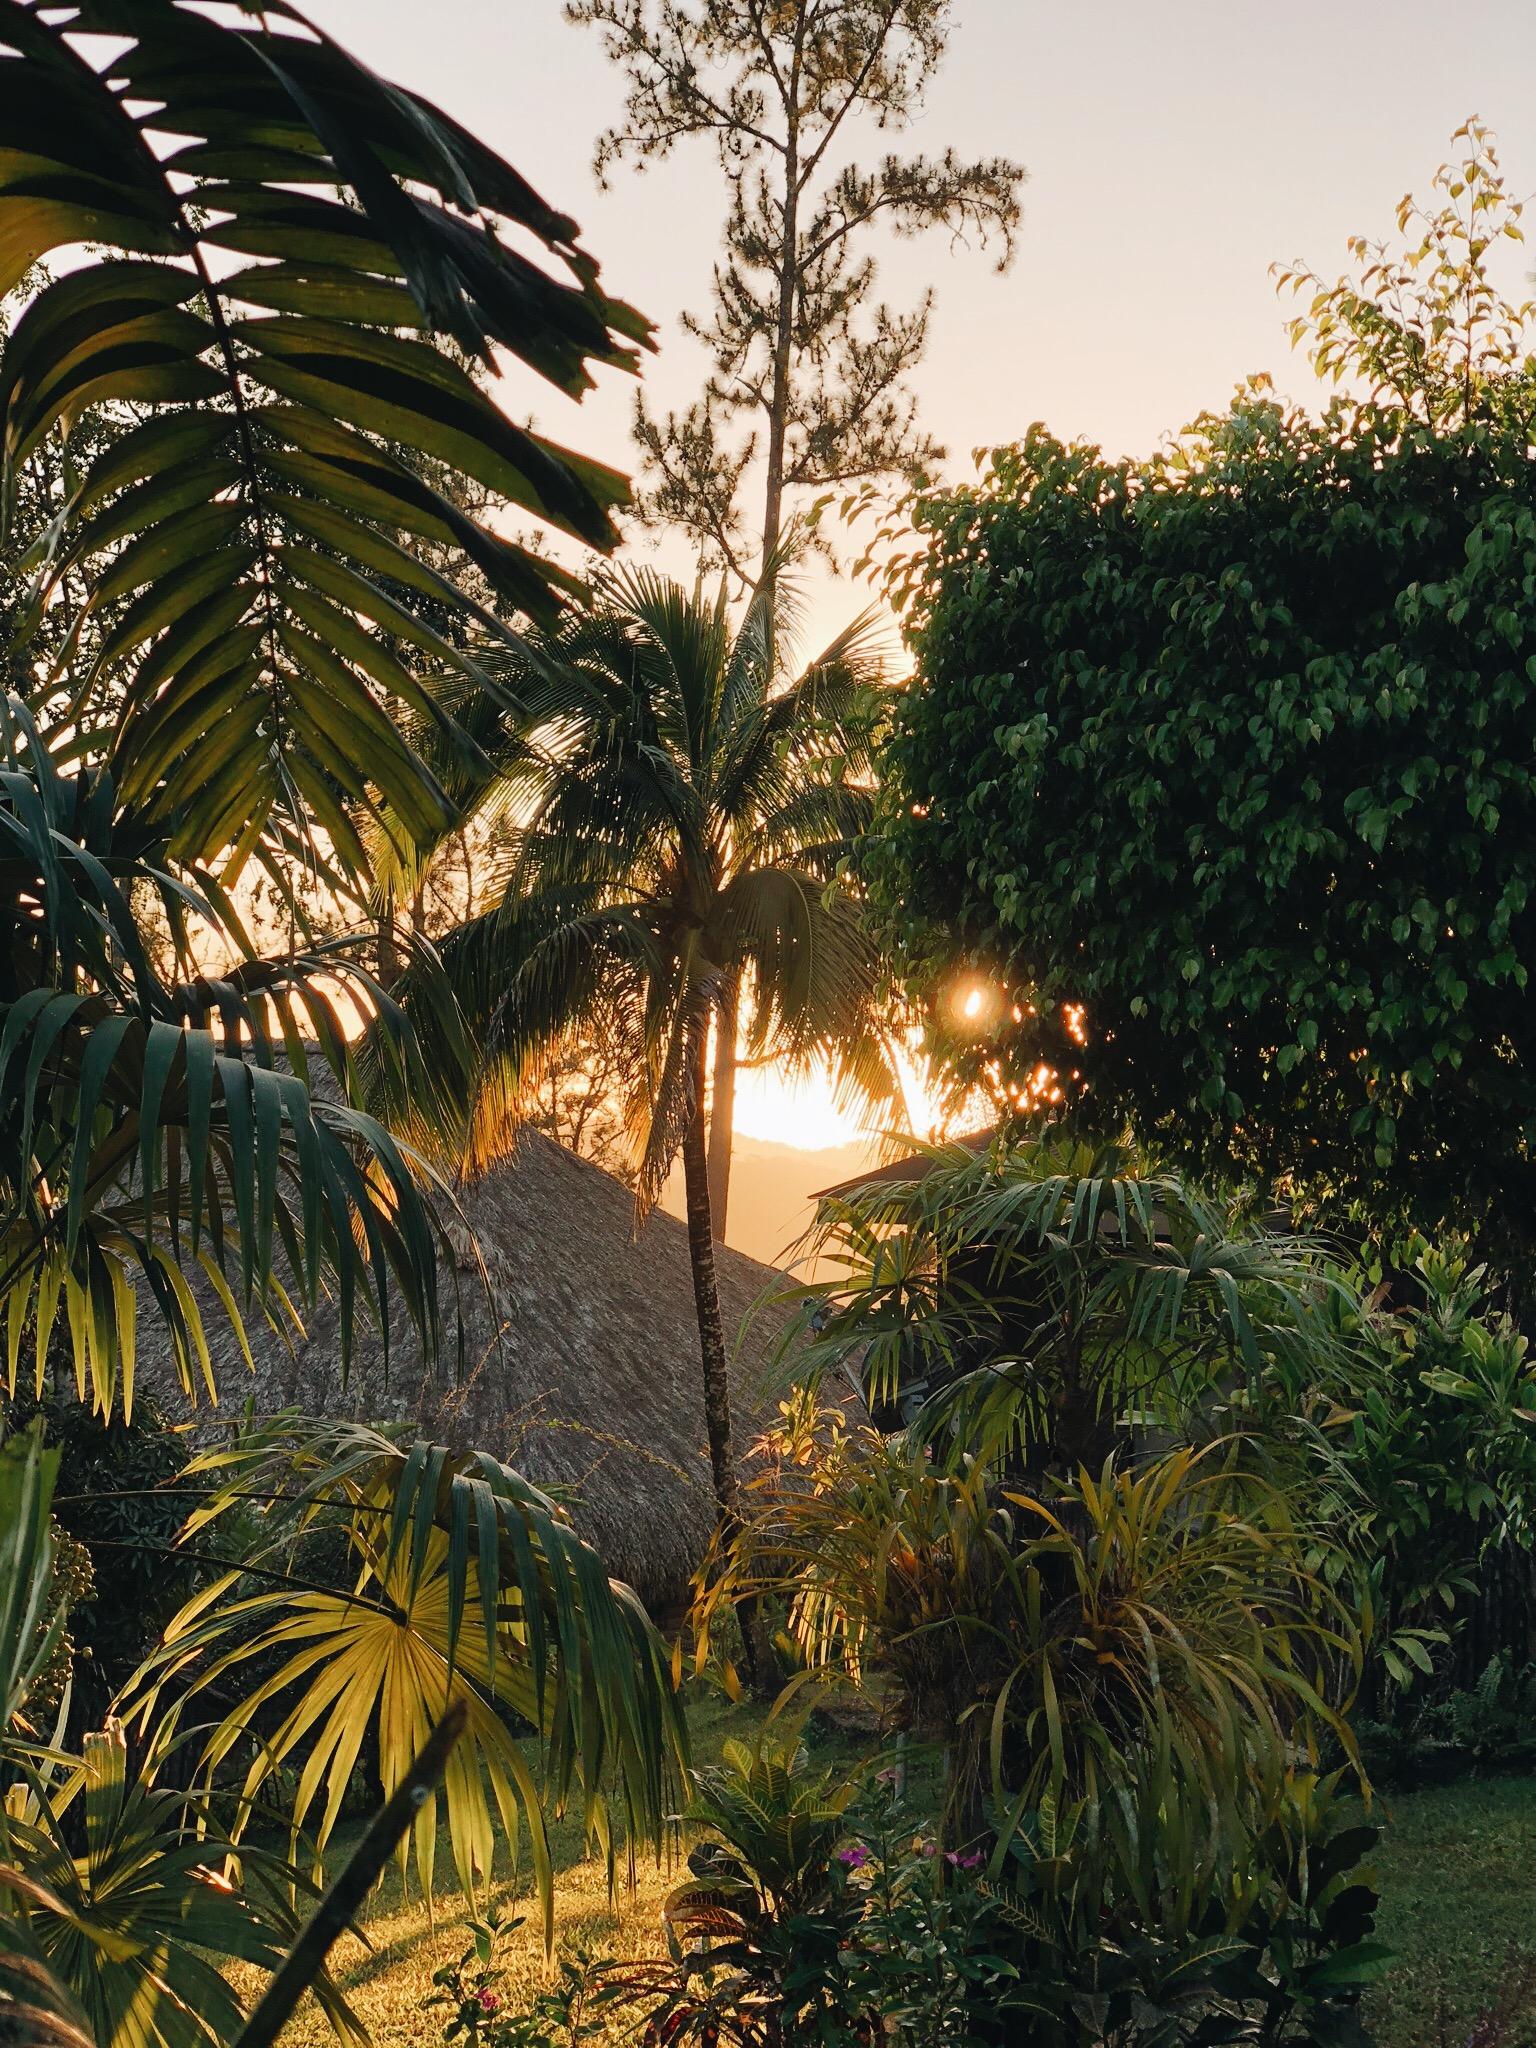 Sunset at GAIA Riverlodge - Belize